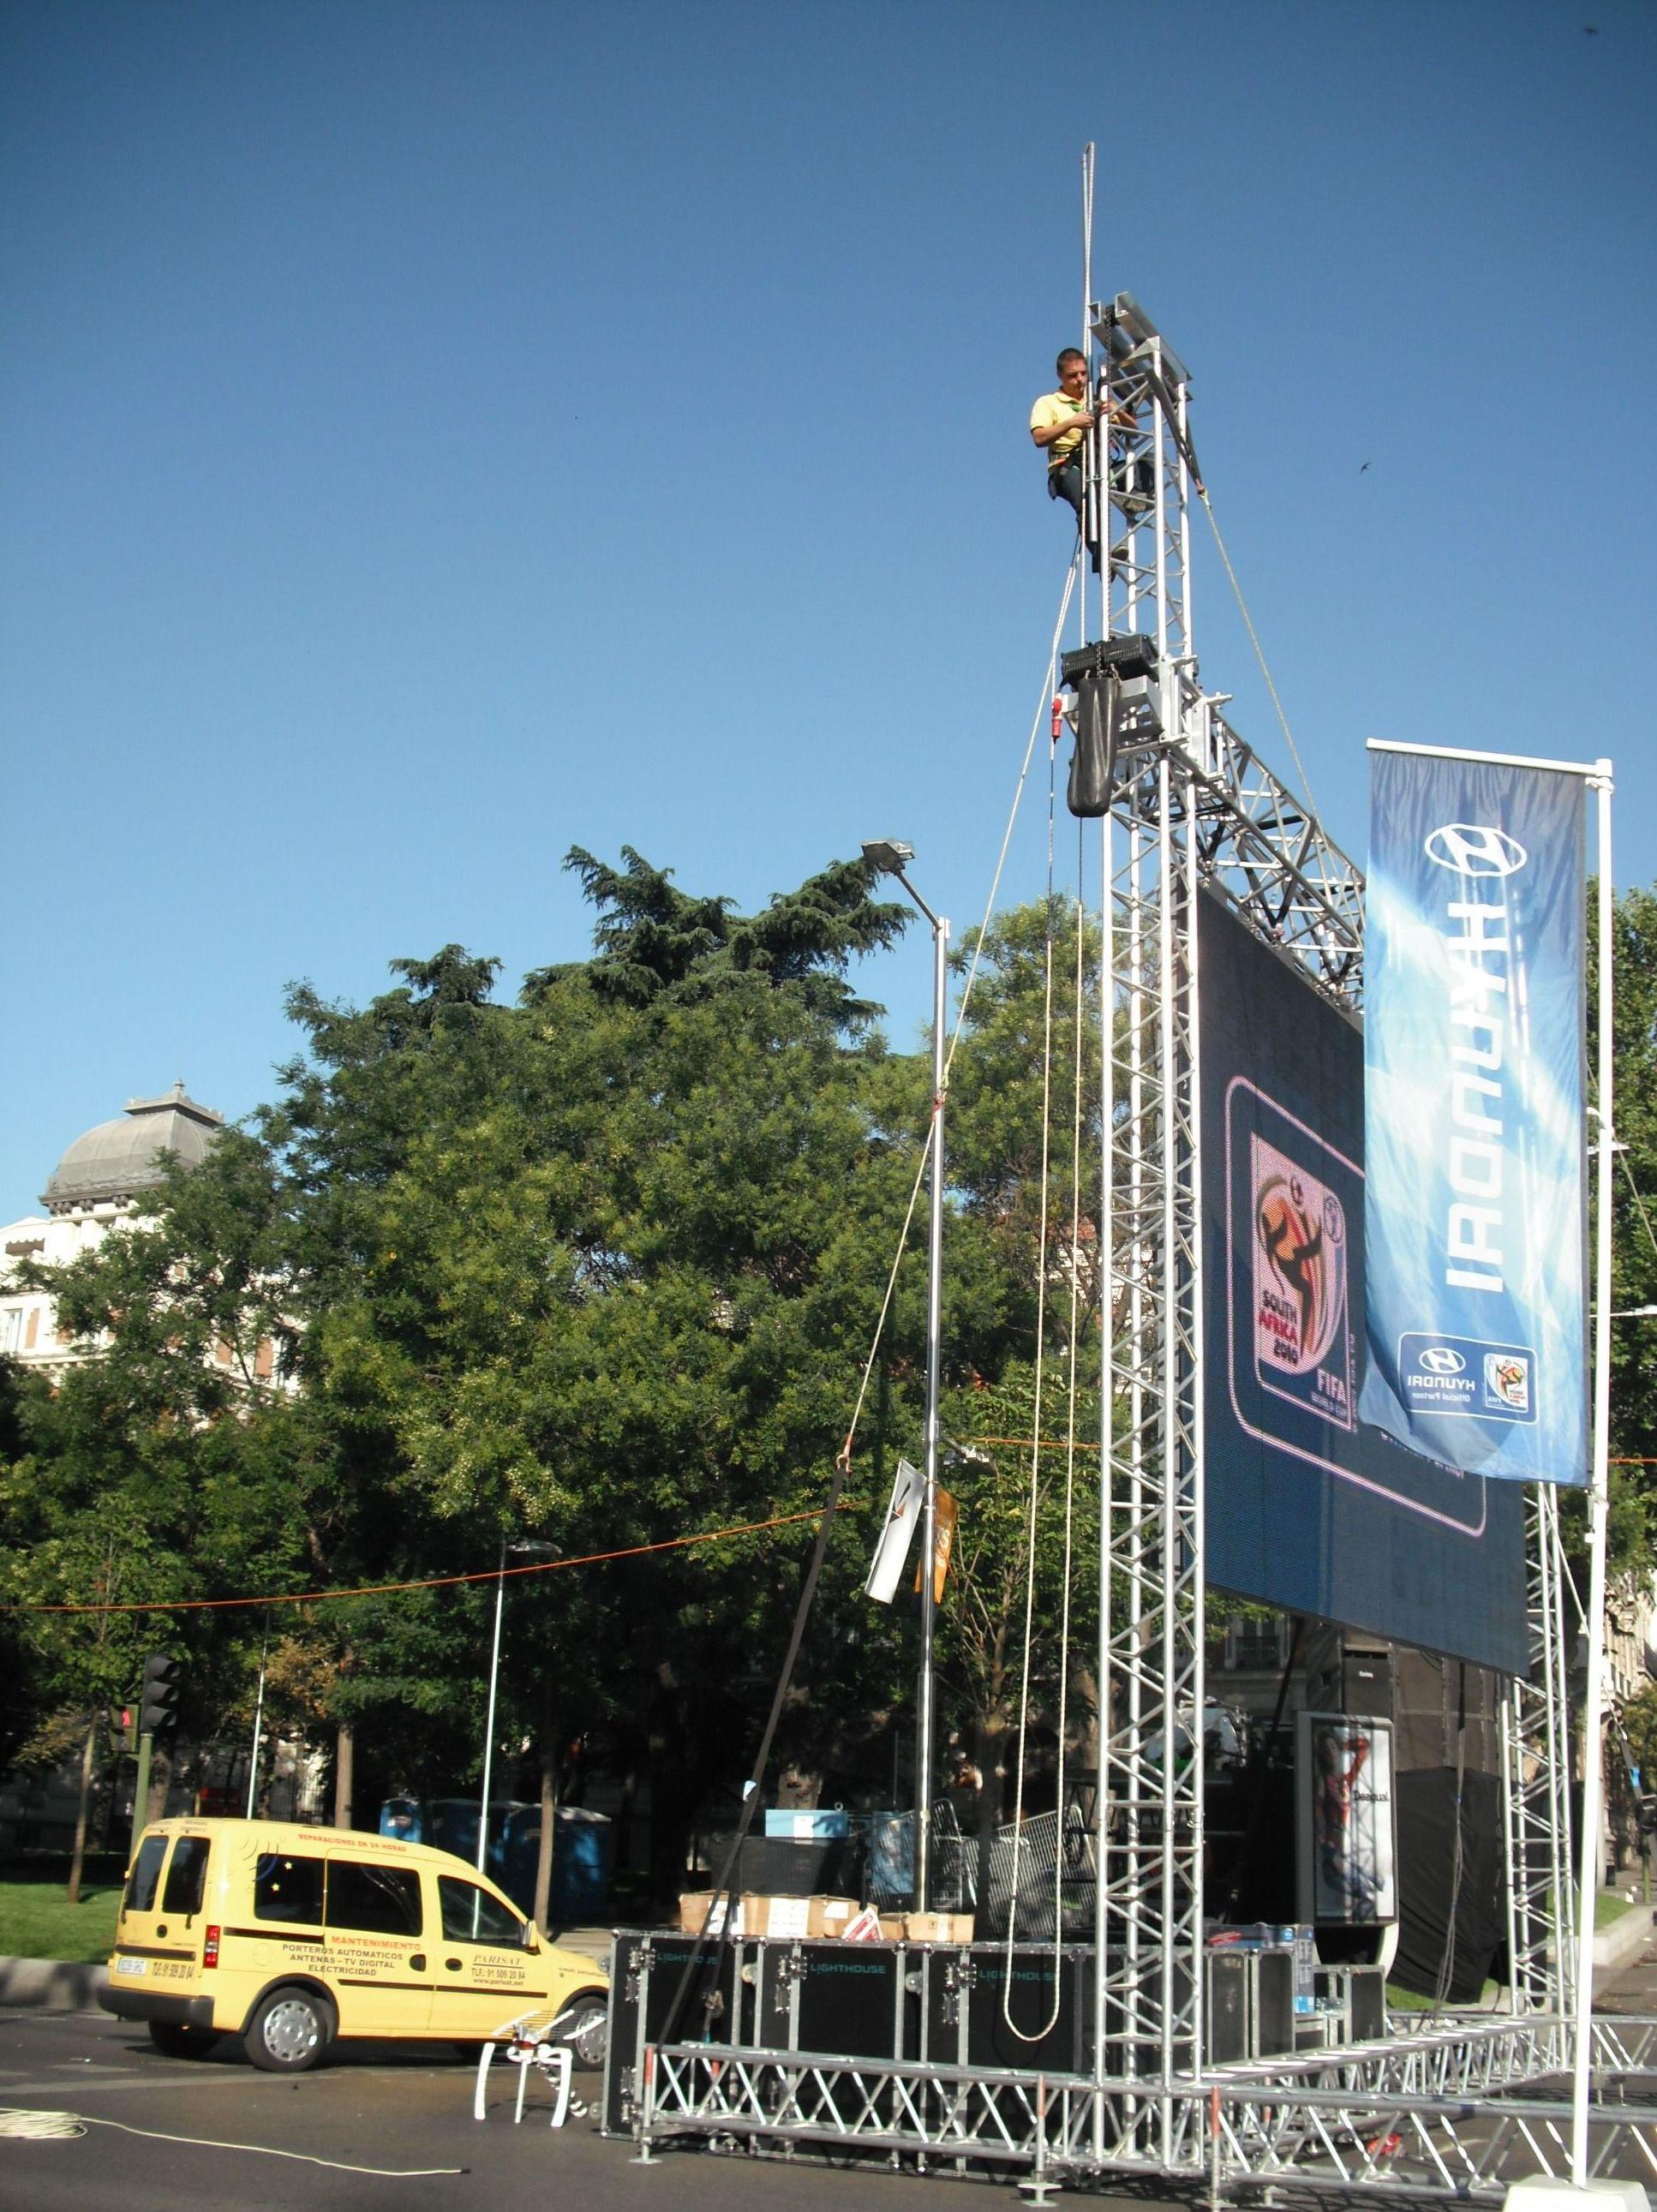 Pantalla gigante en Paseo de la Castellana, Mundial 2010